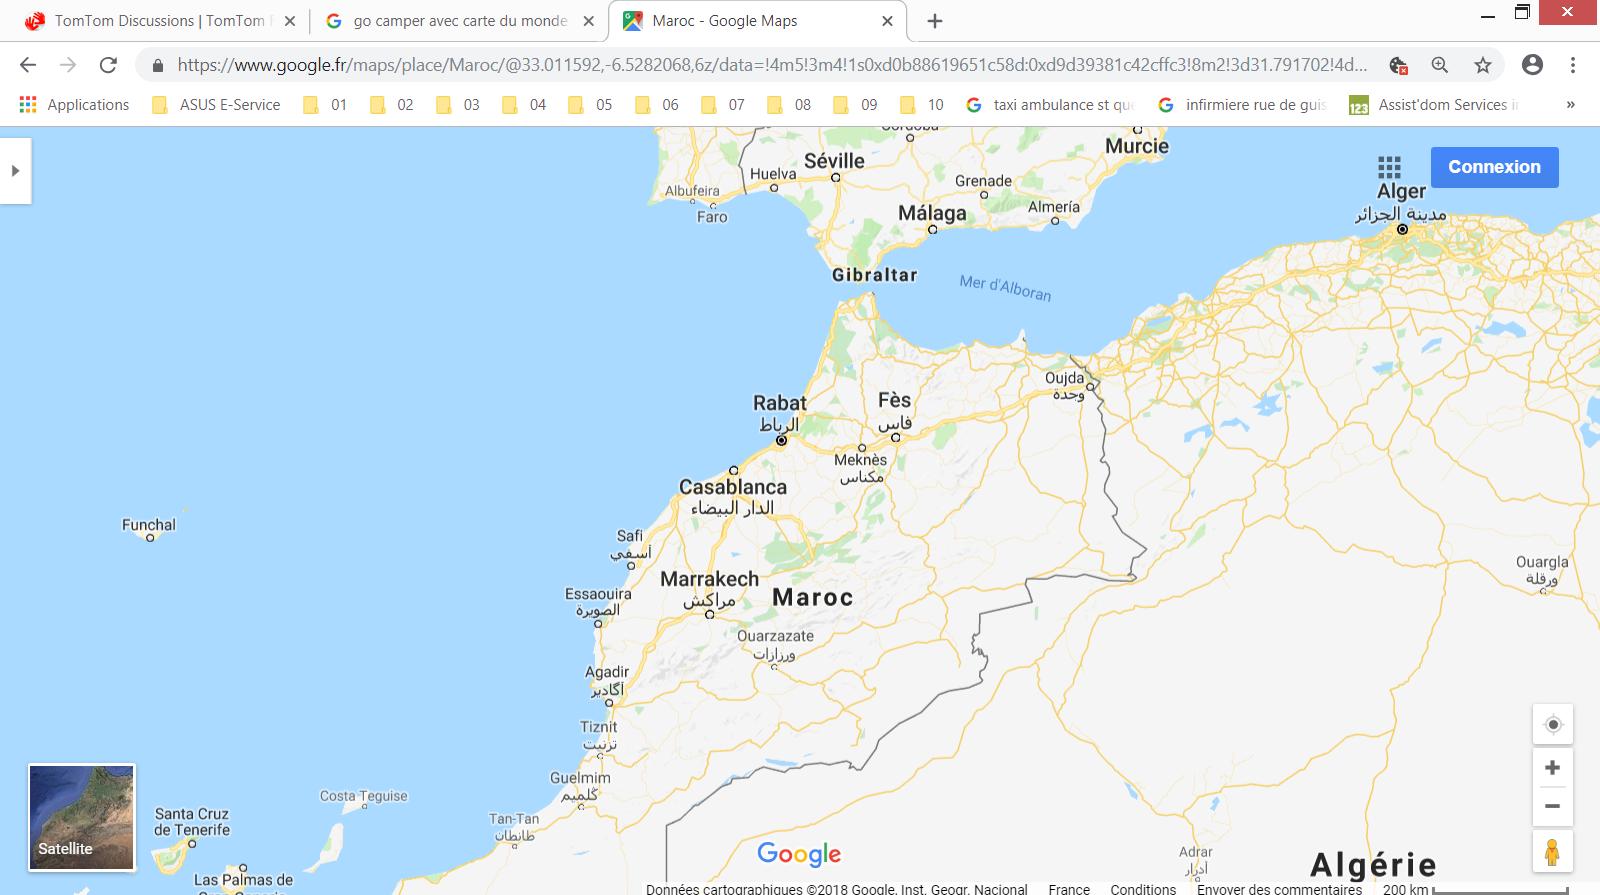 Carte Western Europe Tomtom Go 720.Telecharger Gratuit Carte Maroc Gps Tomtom Go 720 My First